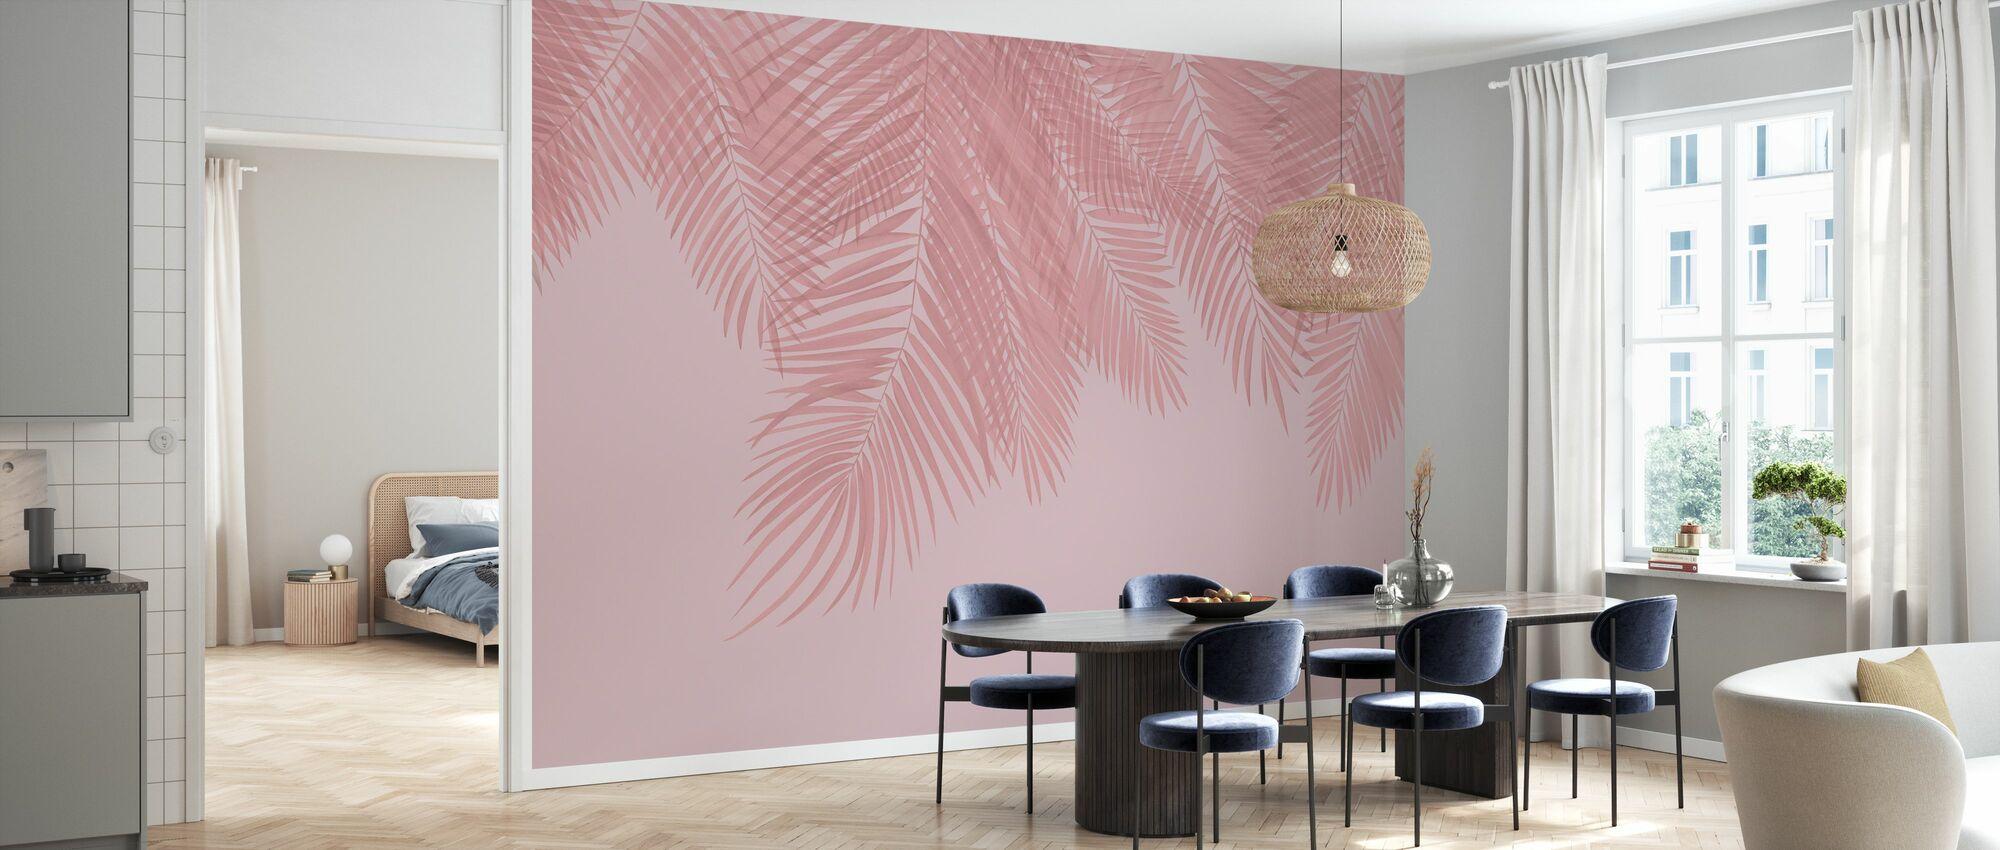 Hanging Palm Leaves - Pink - Wallpaper - Kitchen